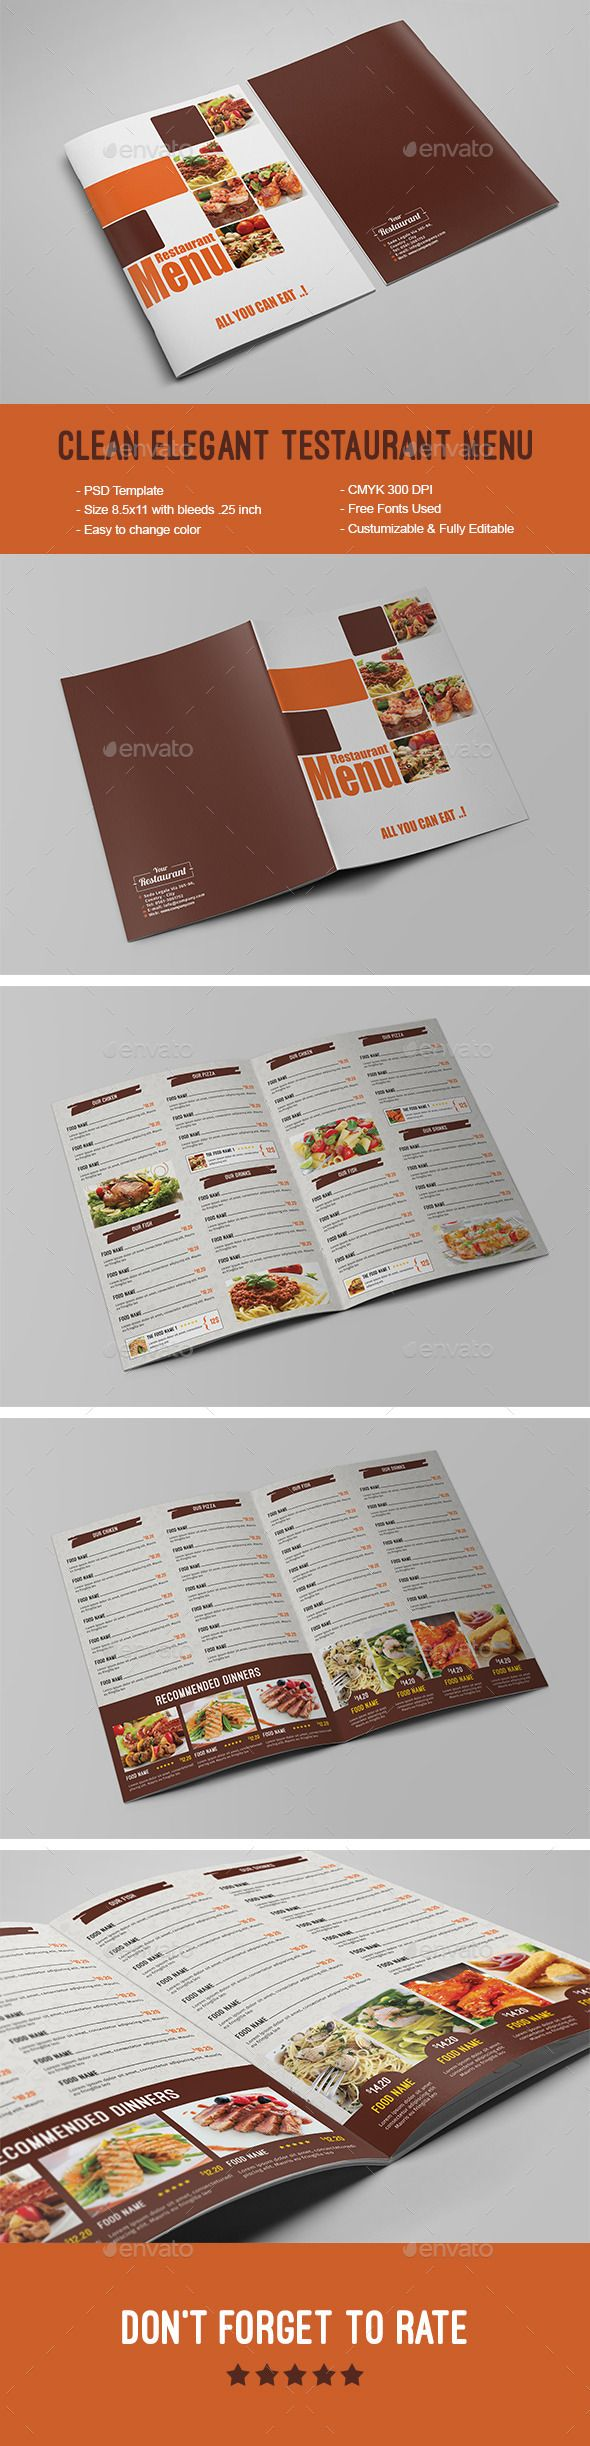 Best Restaurant Menu Template Images On   Restaurant